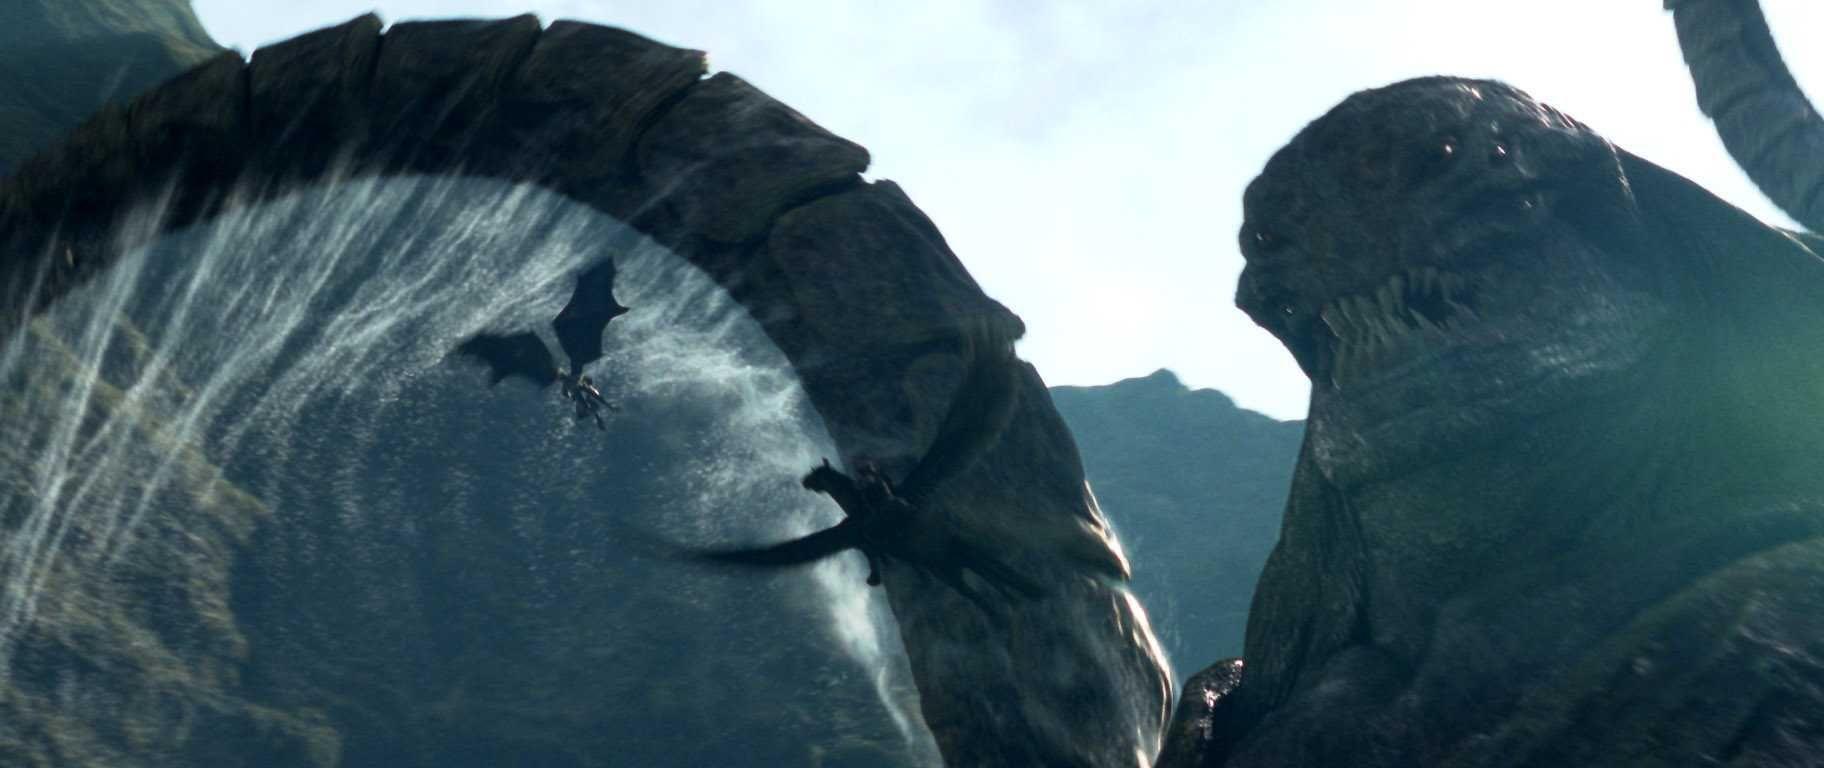 Kraken (2010 Clash of the Titans) | Mythology | Pinterest